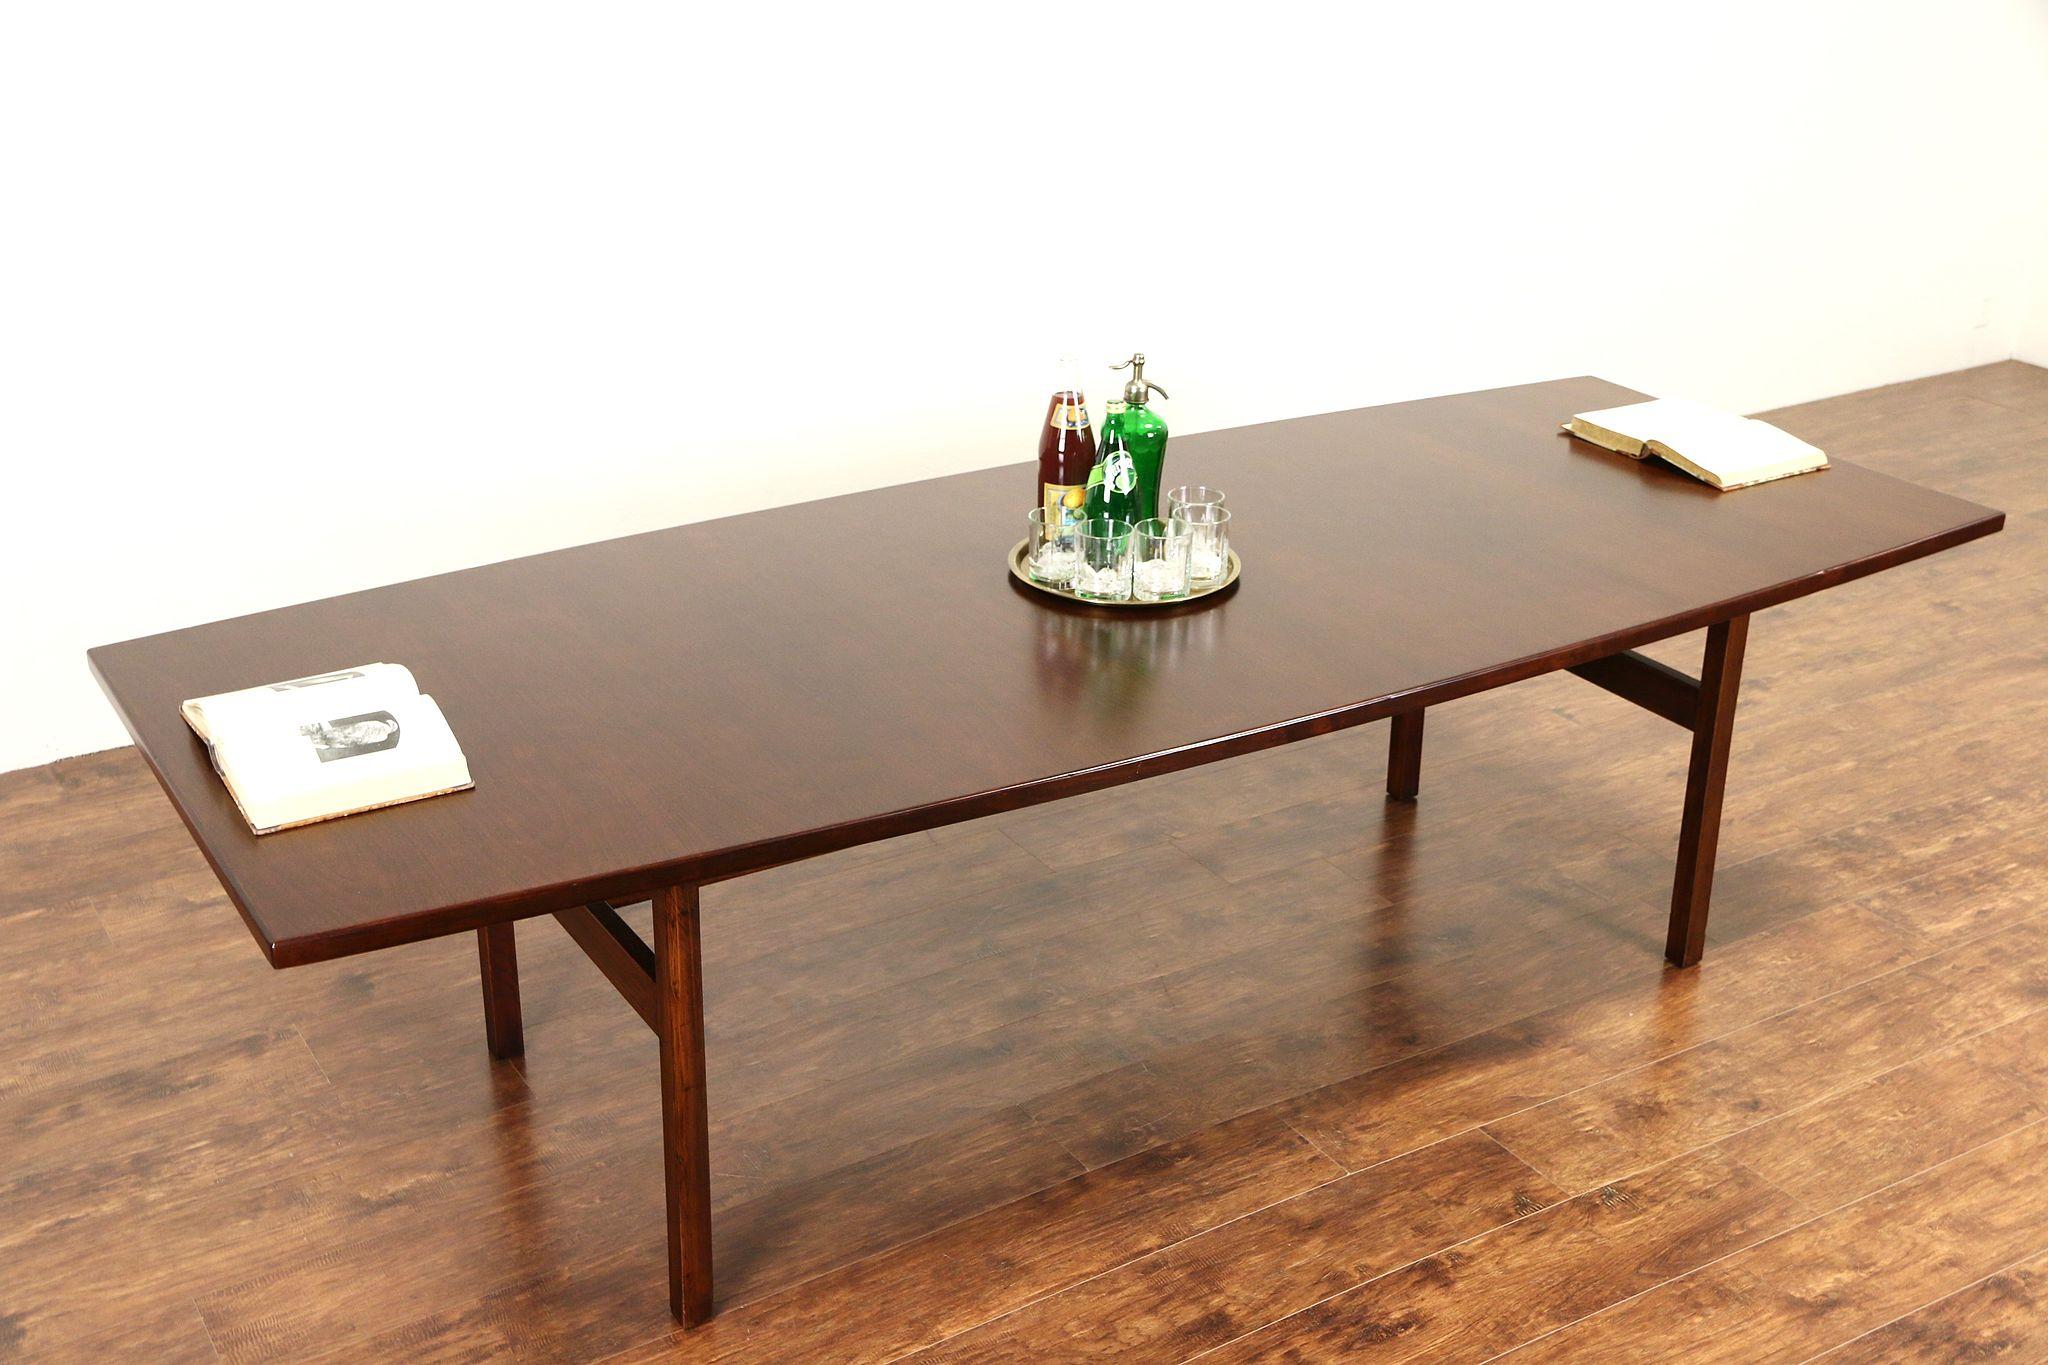 Jens Risom Signed 1960 Vintage Midcentury Modern 9 Dining Or Conference Table